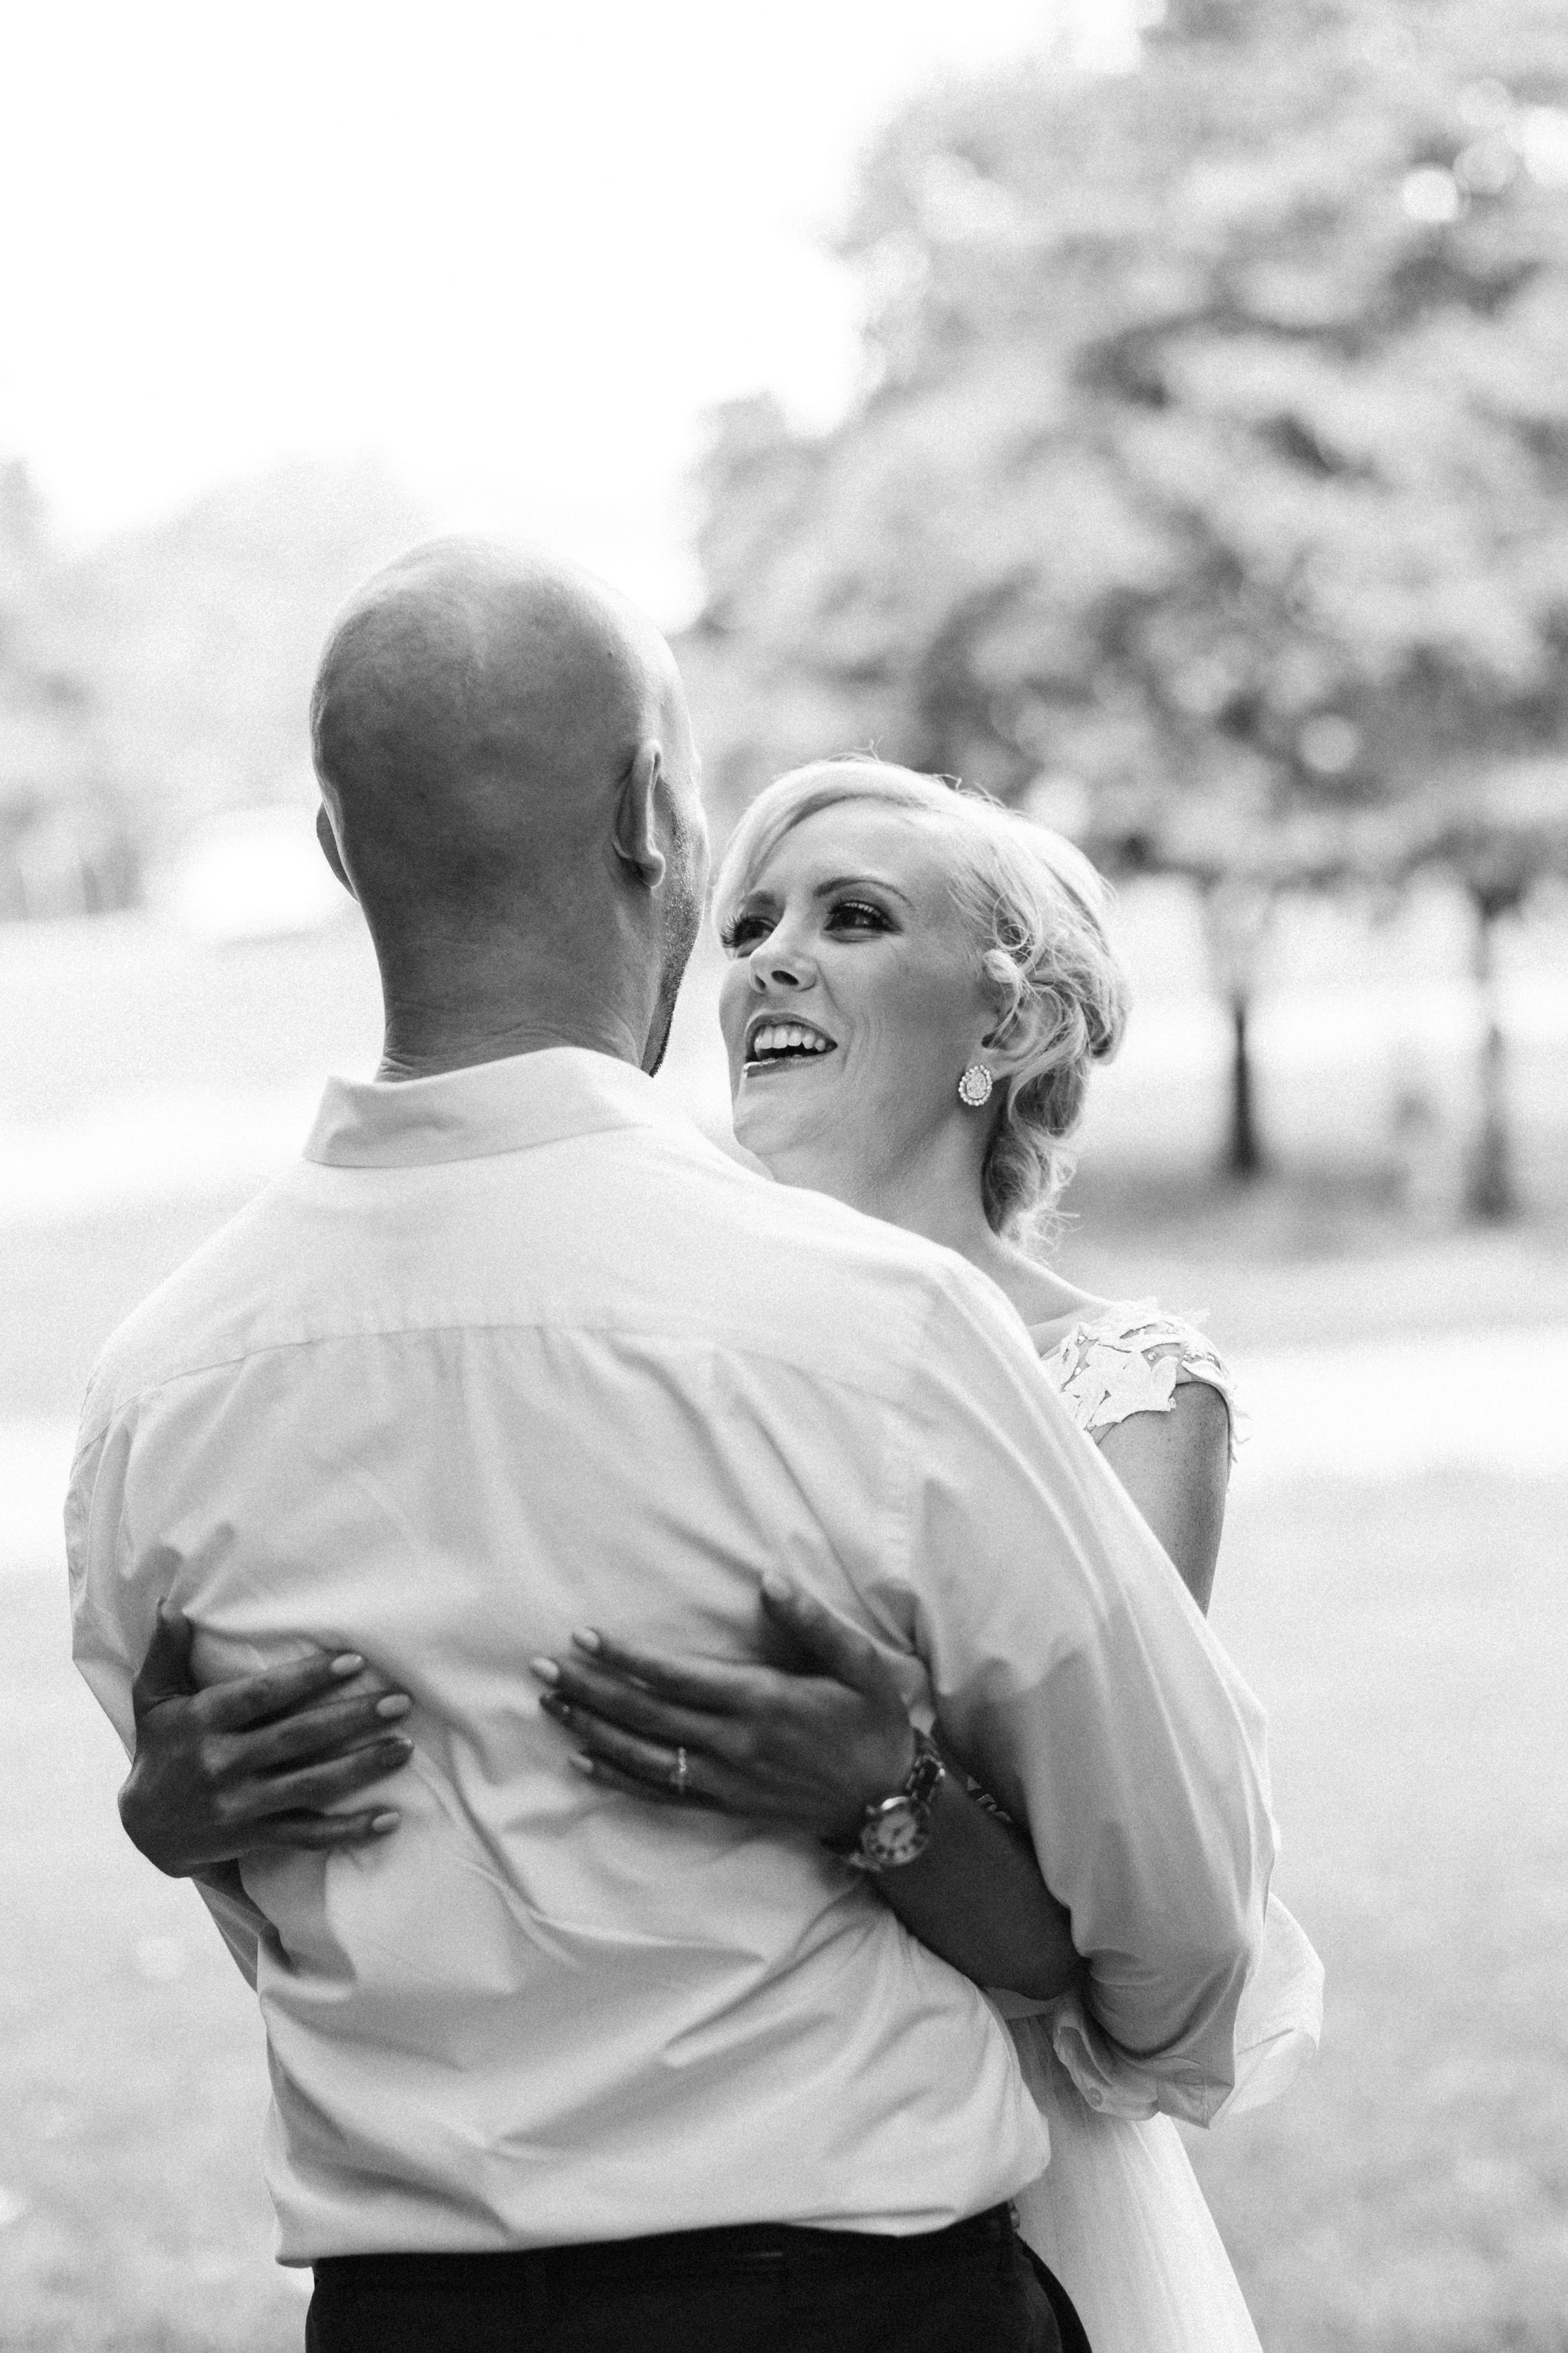 2018.09.02 Ray and Sarah Prizner Nashville TN Wedding FINALS-59.jpg